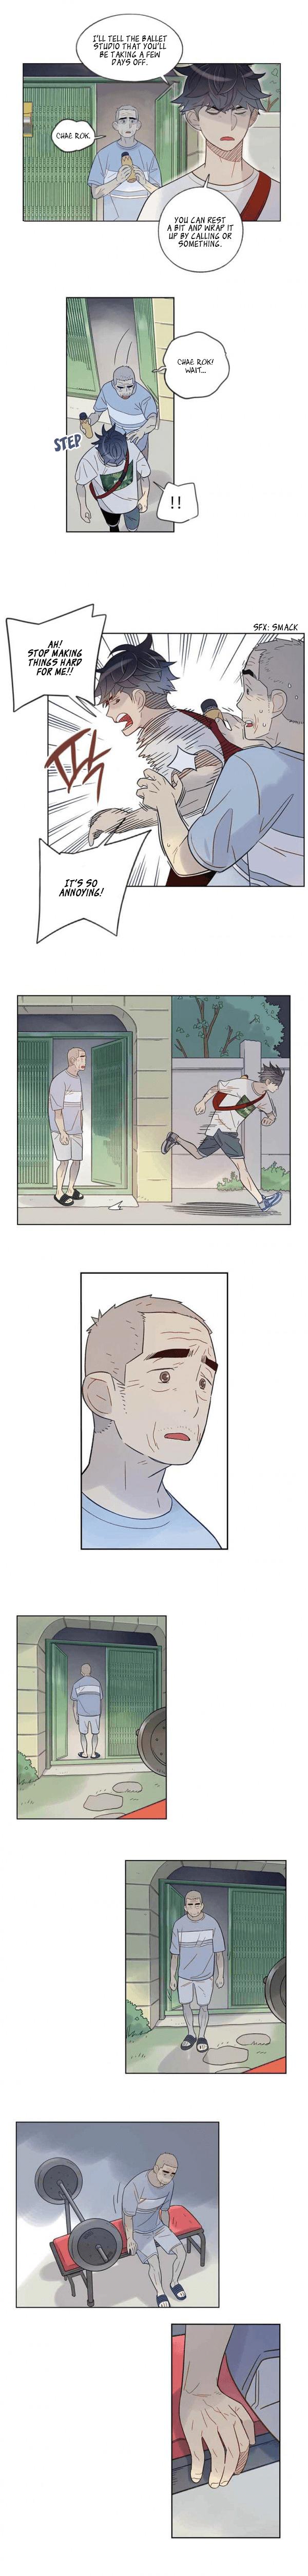 Manga Like a Butterfly - Chapter 41 Page 2